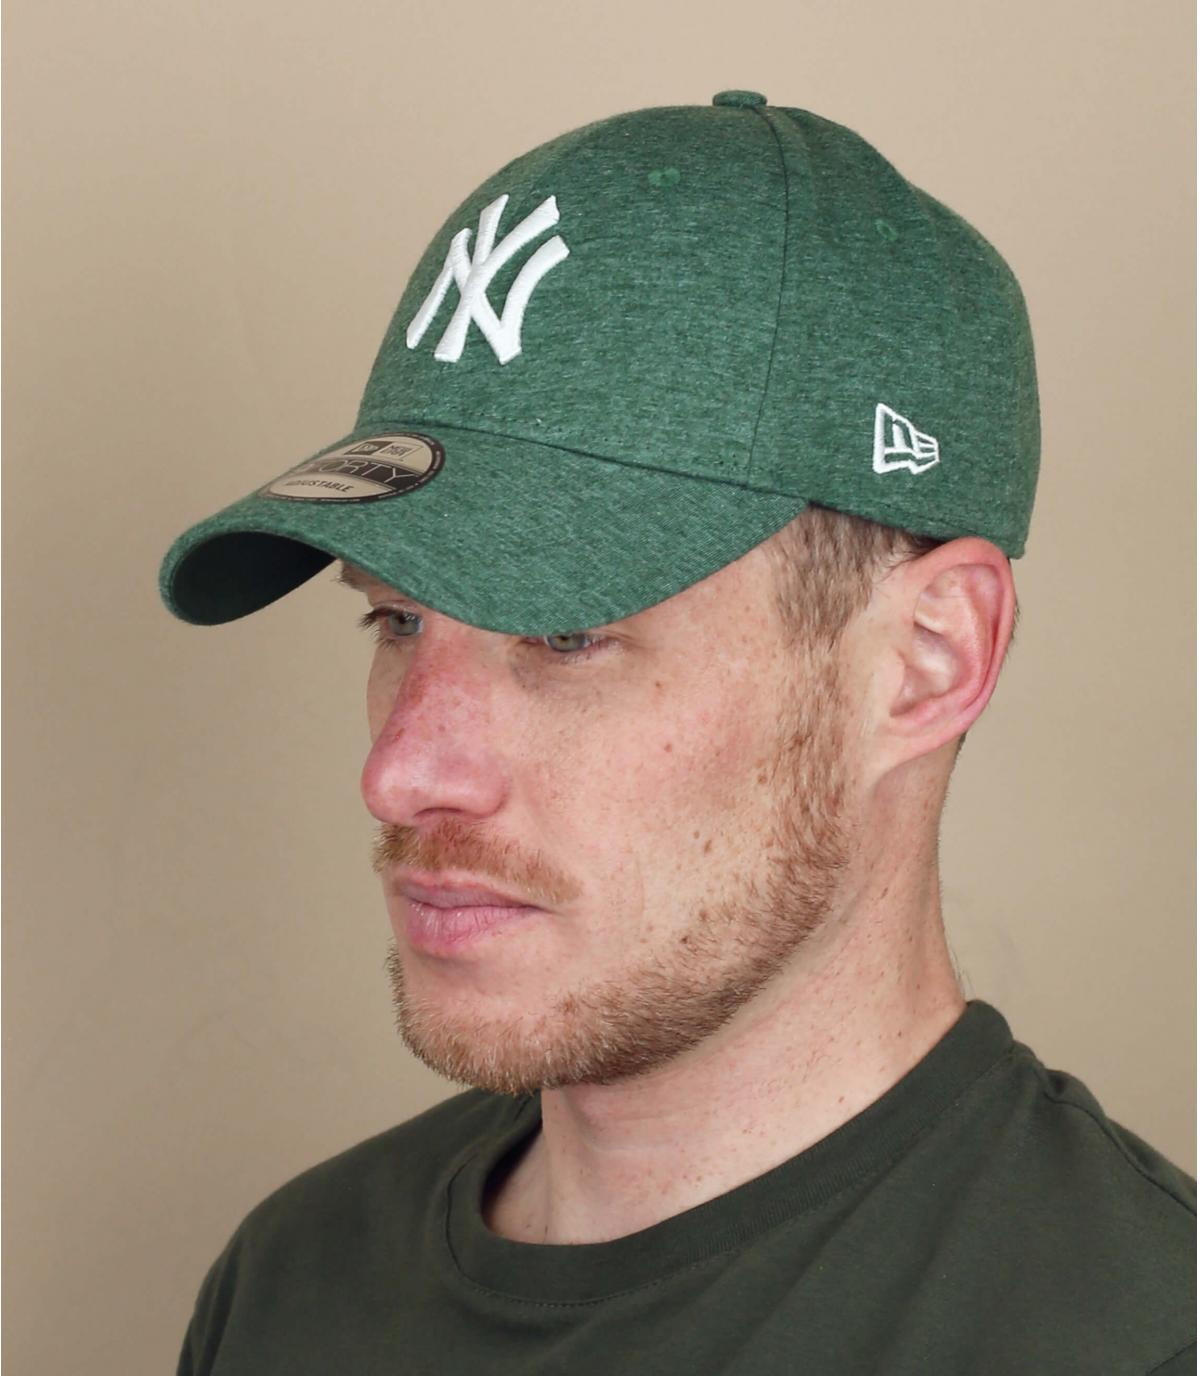 pet NY groen wit